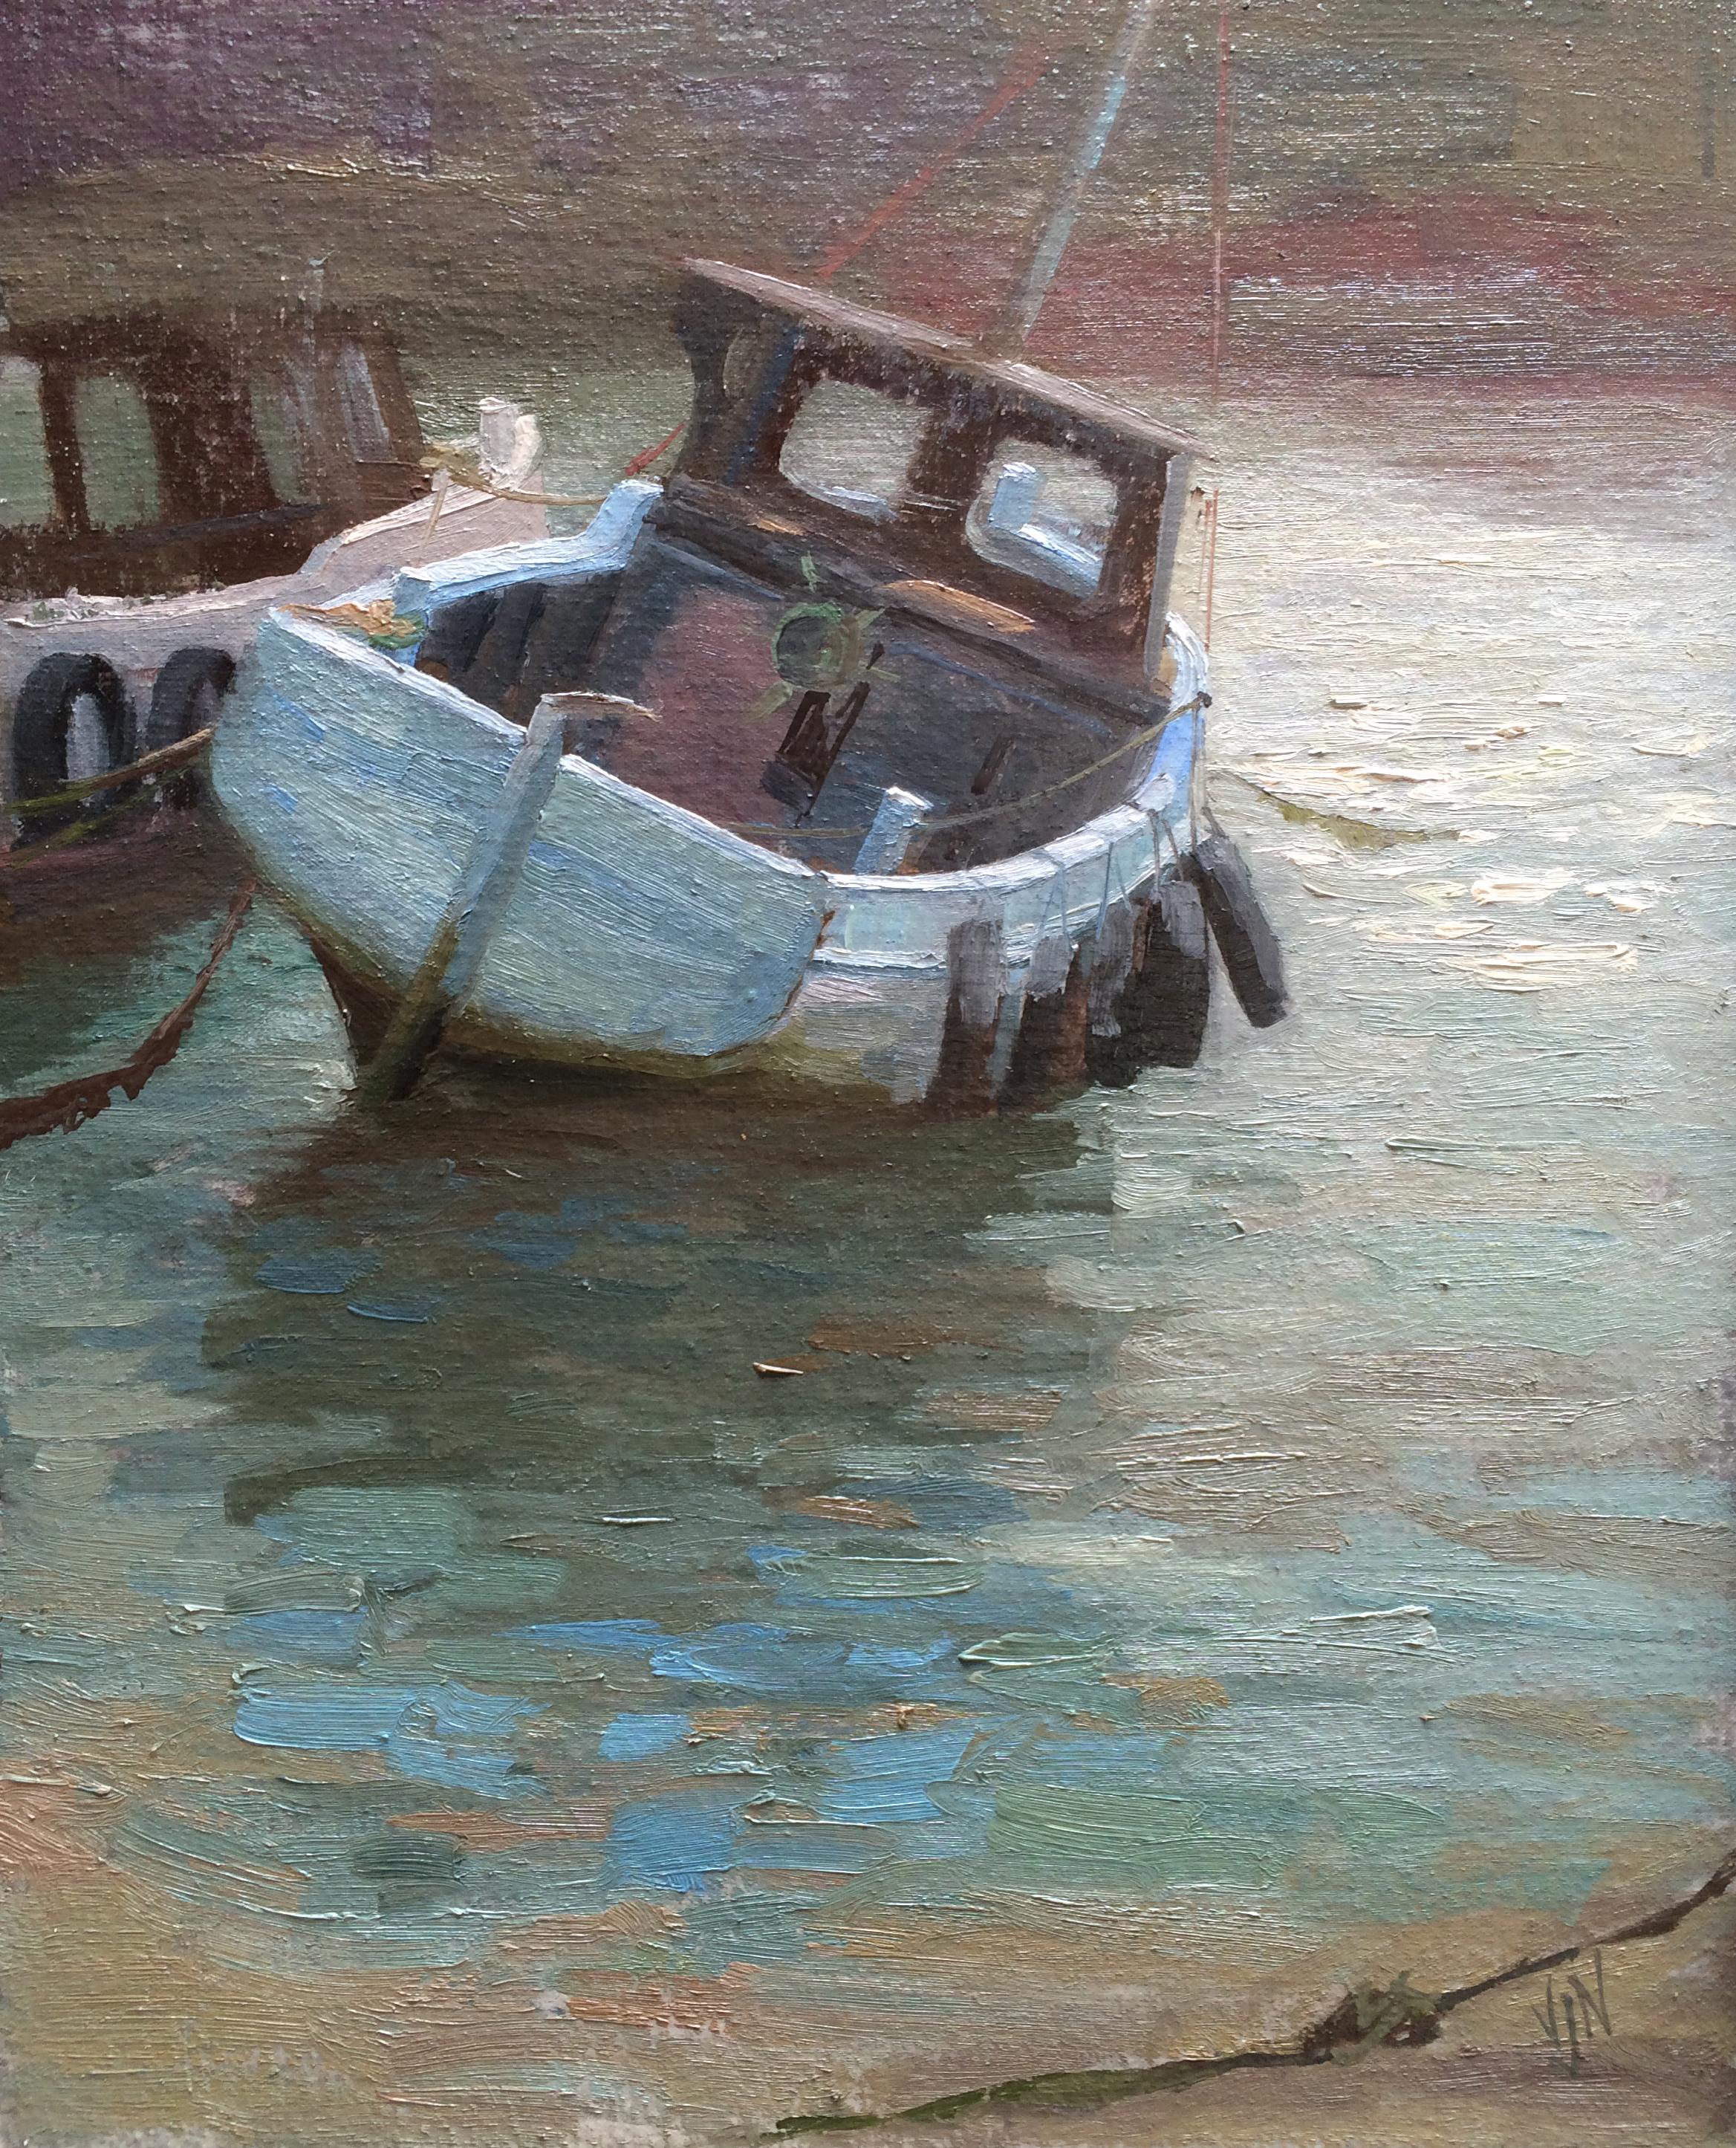 Ballyhack Boat